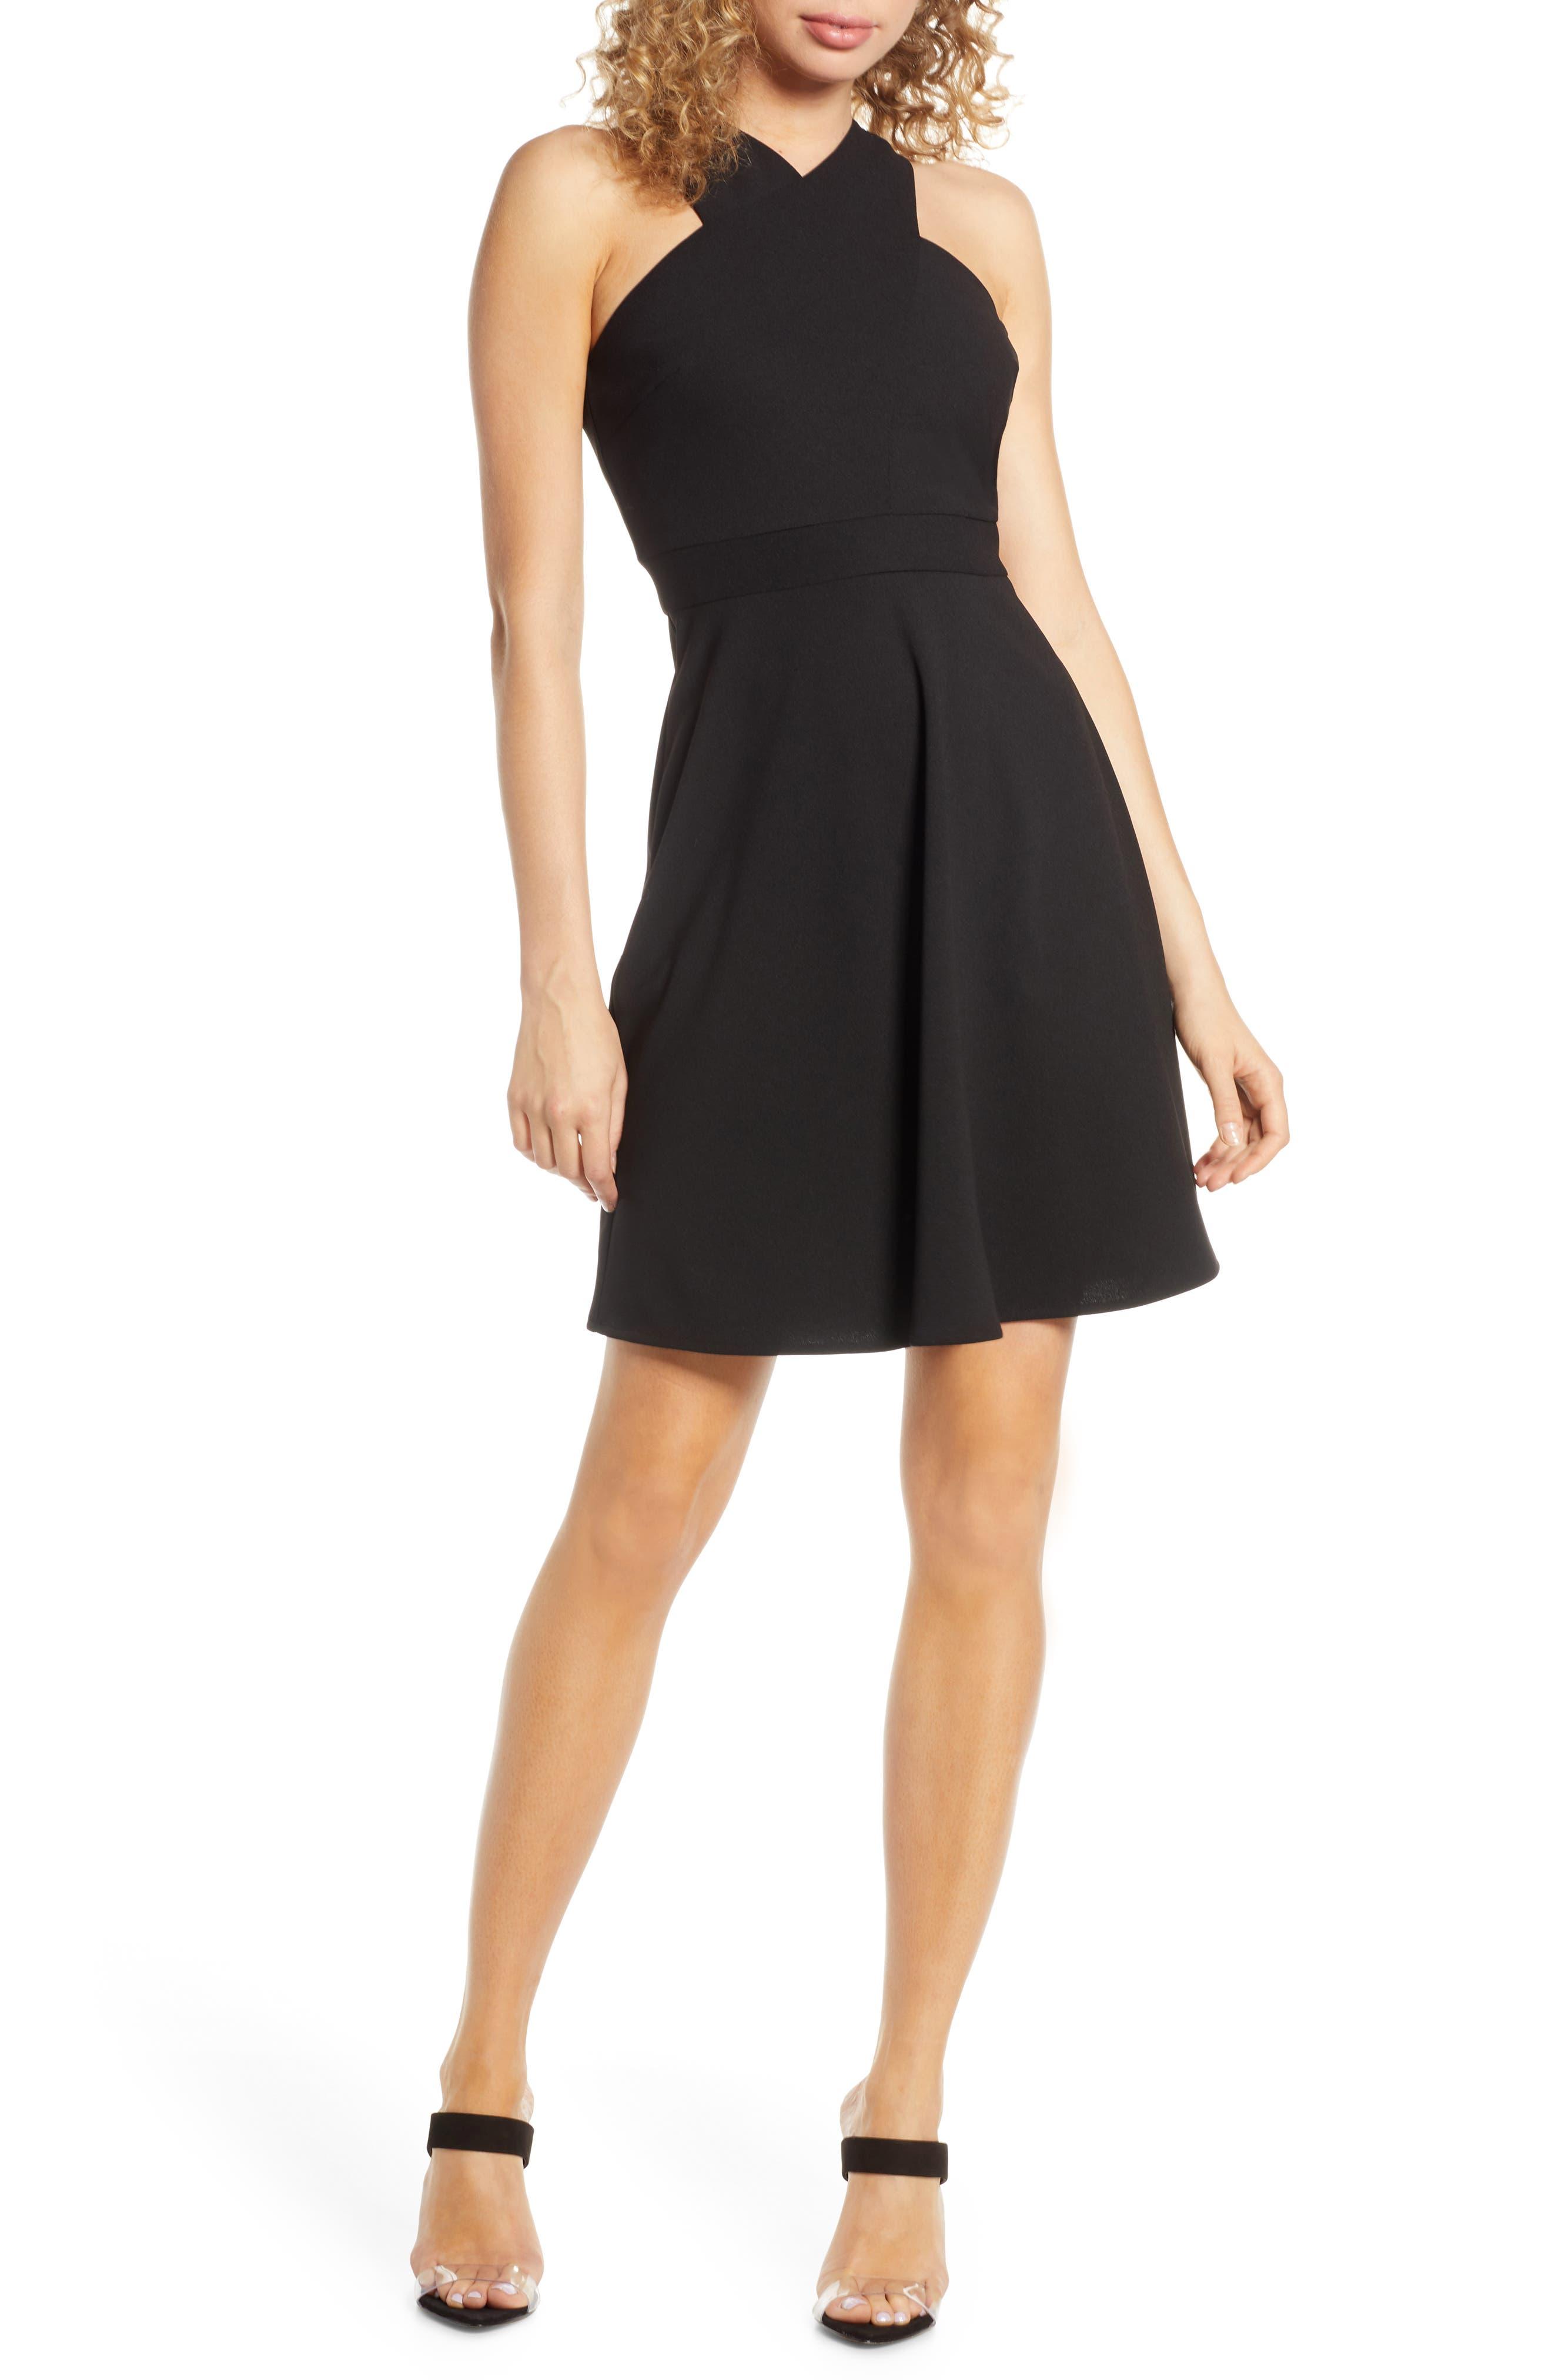 Sam Edelman Crisscross Fit & Flare Dress, Black